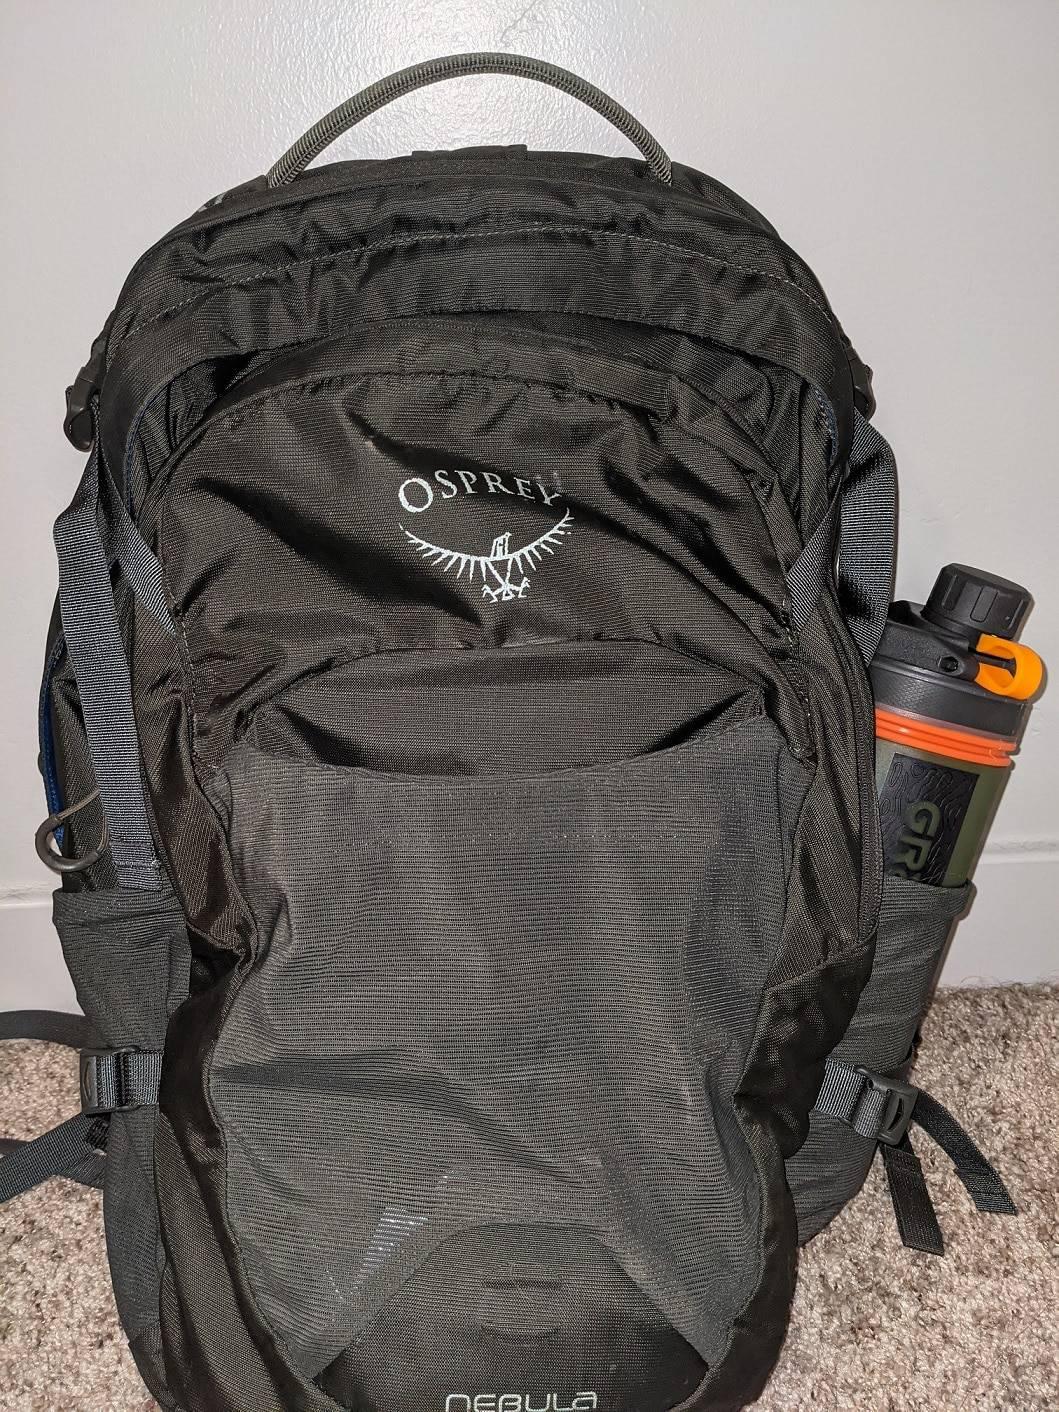 Grayl in Backpack